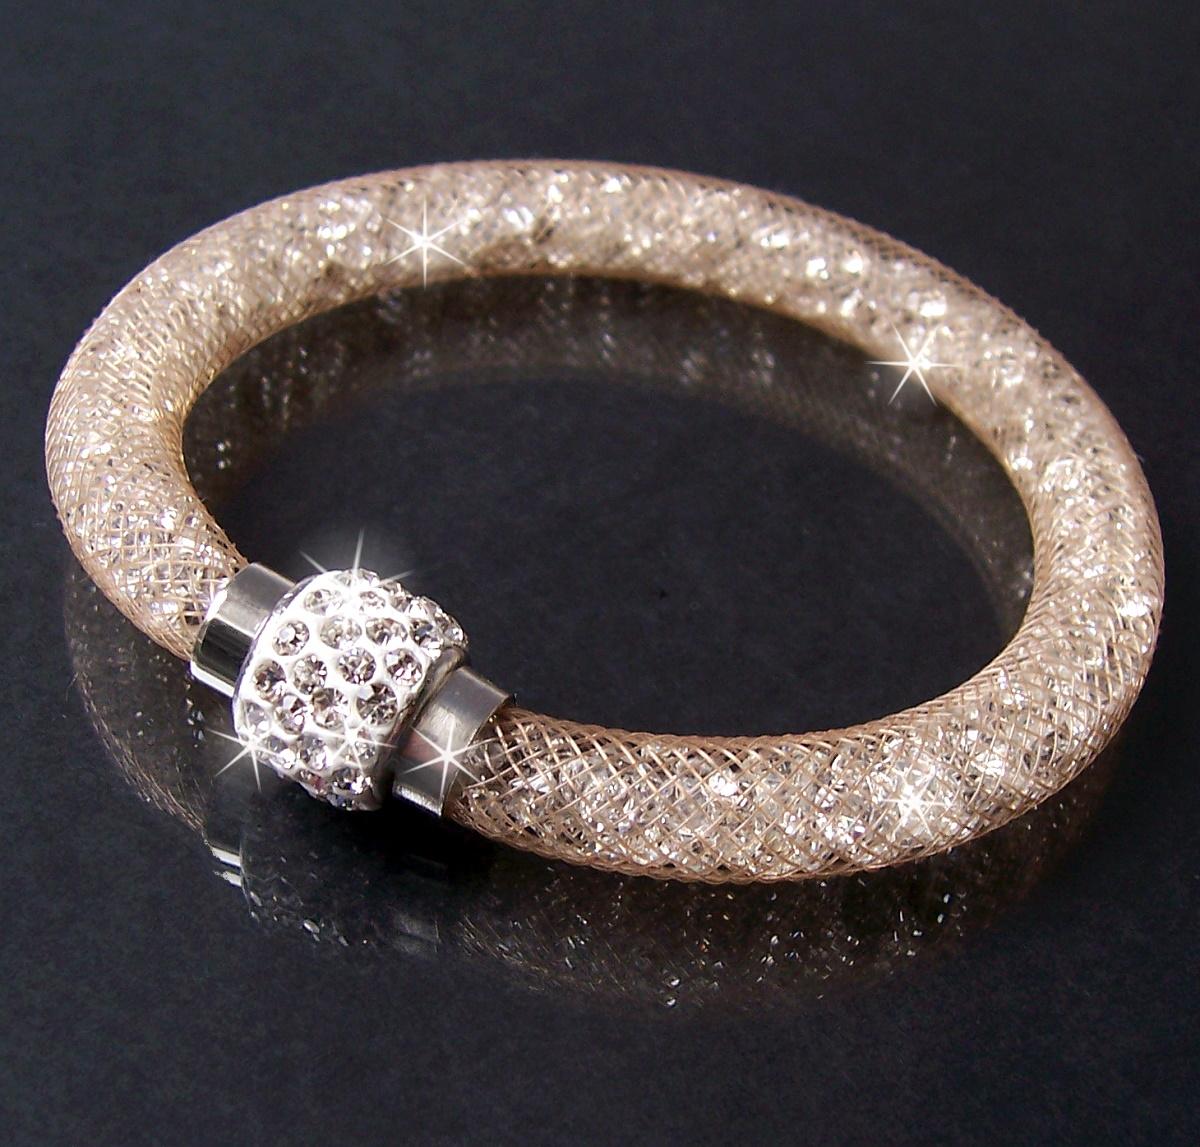 A351# Armband Kristalle in Nylonnetzschlauch Shamballa Star powder neu